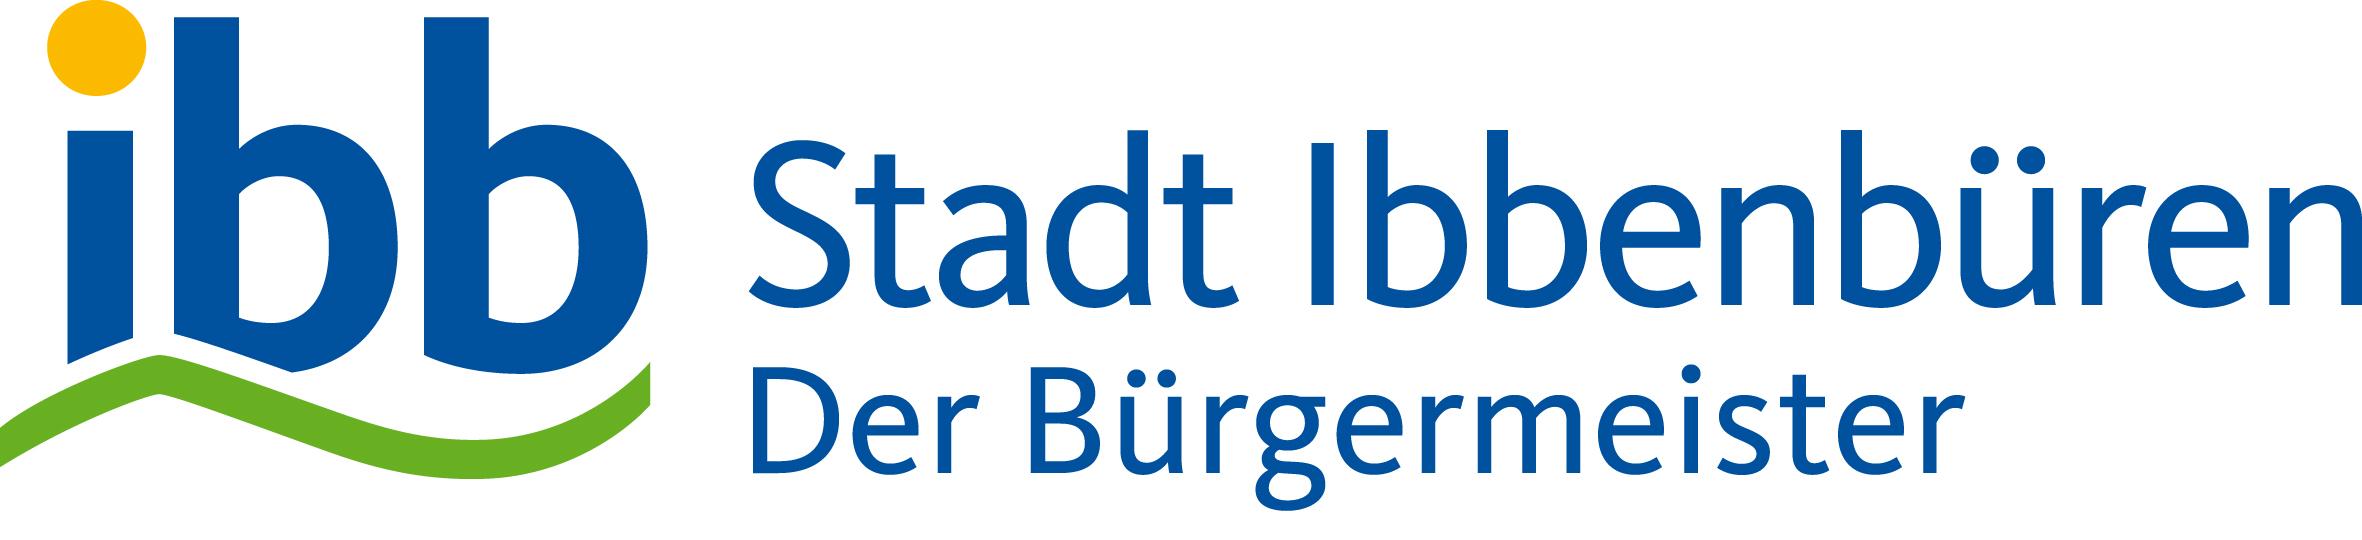 Stadt_Ibbenbueren_Buergermeister_sw.jpg